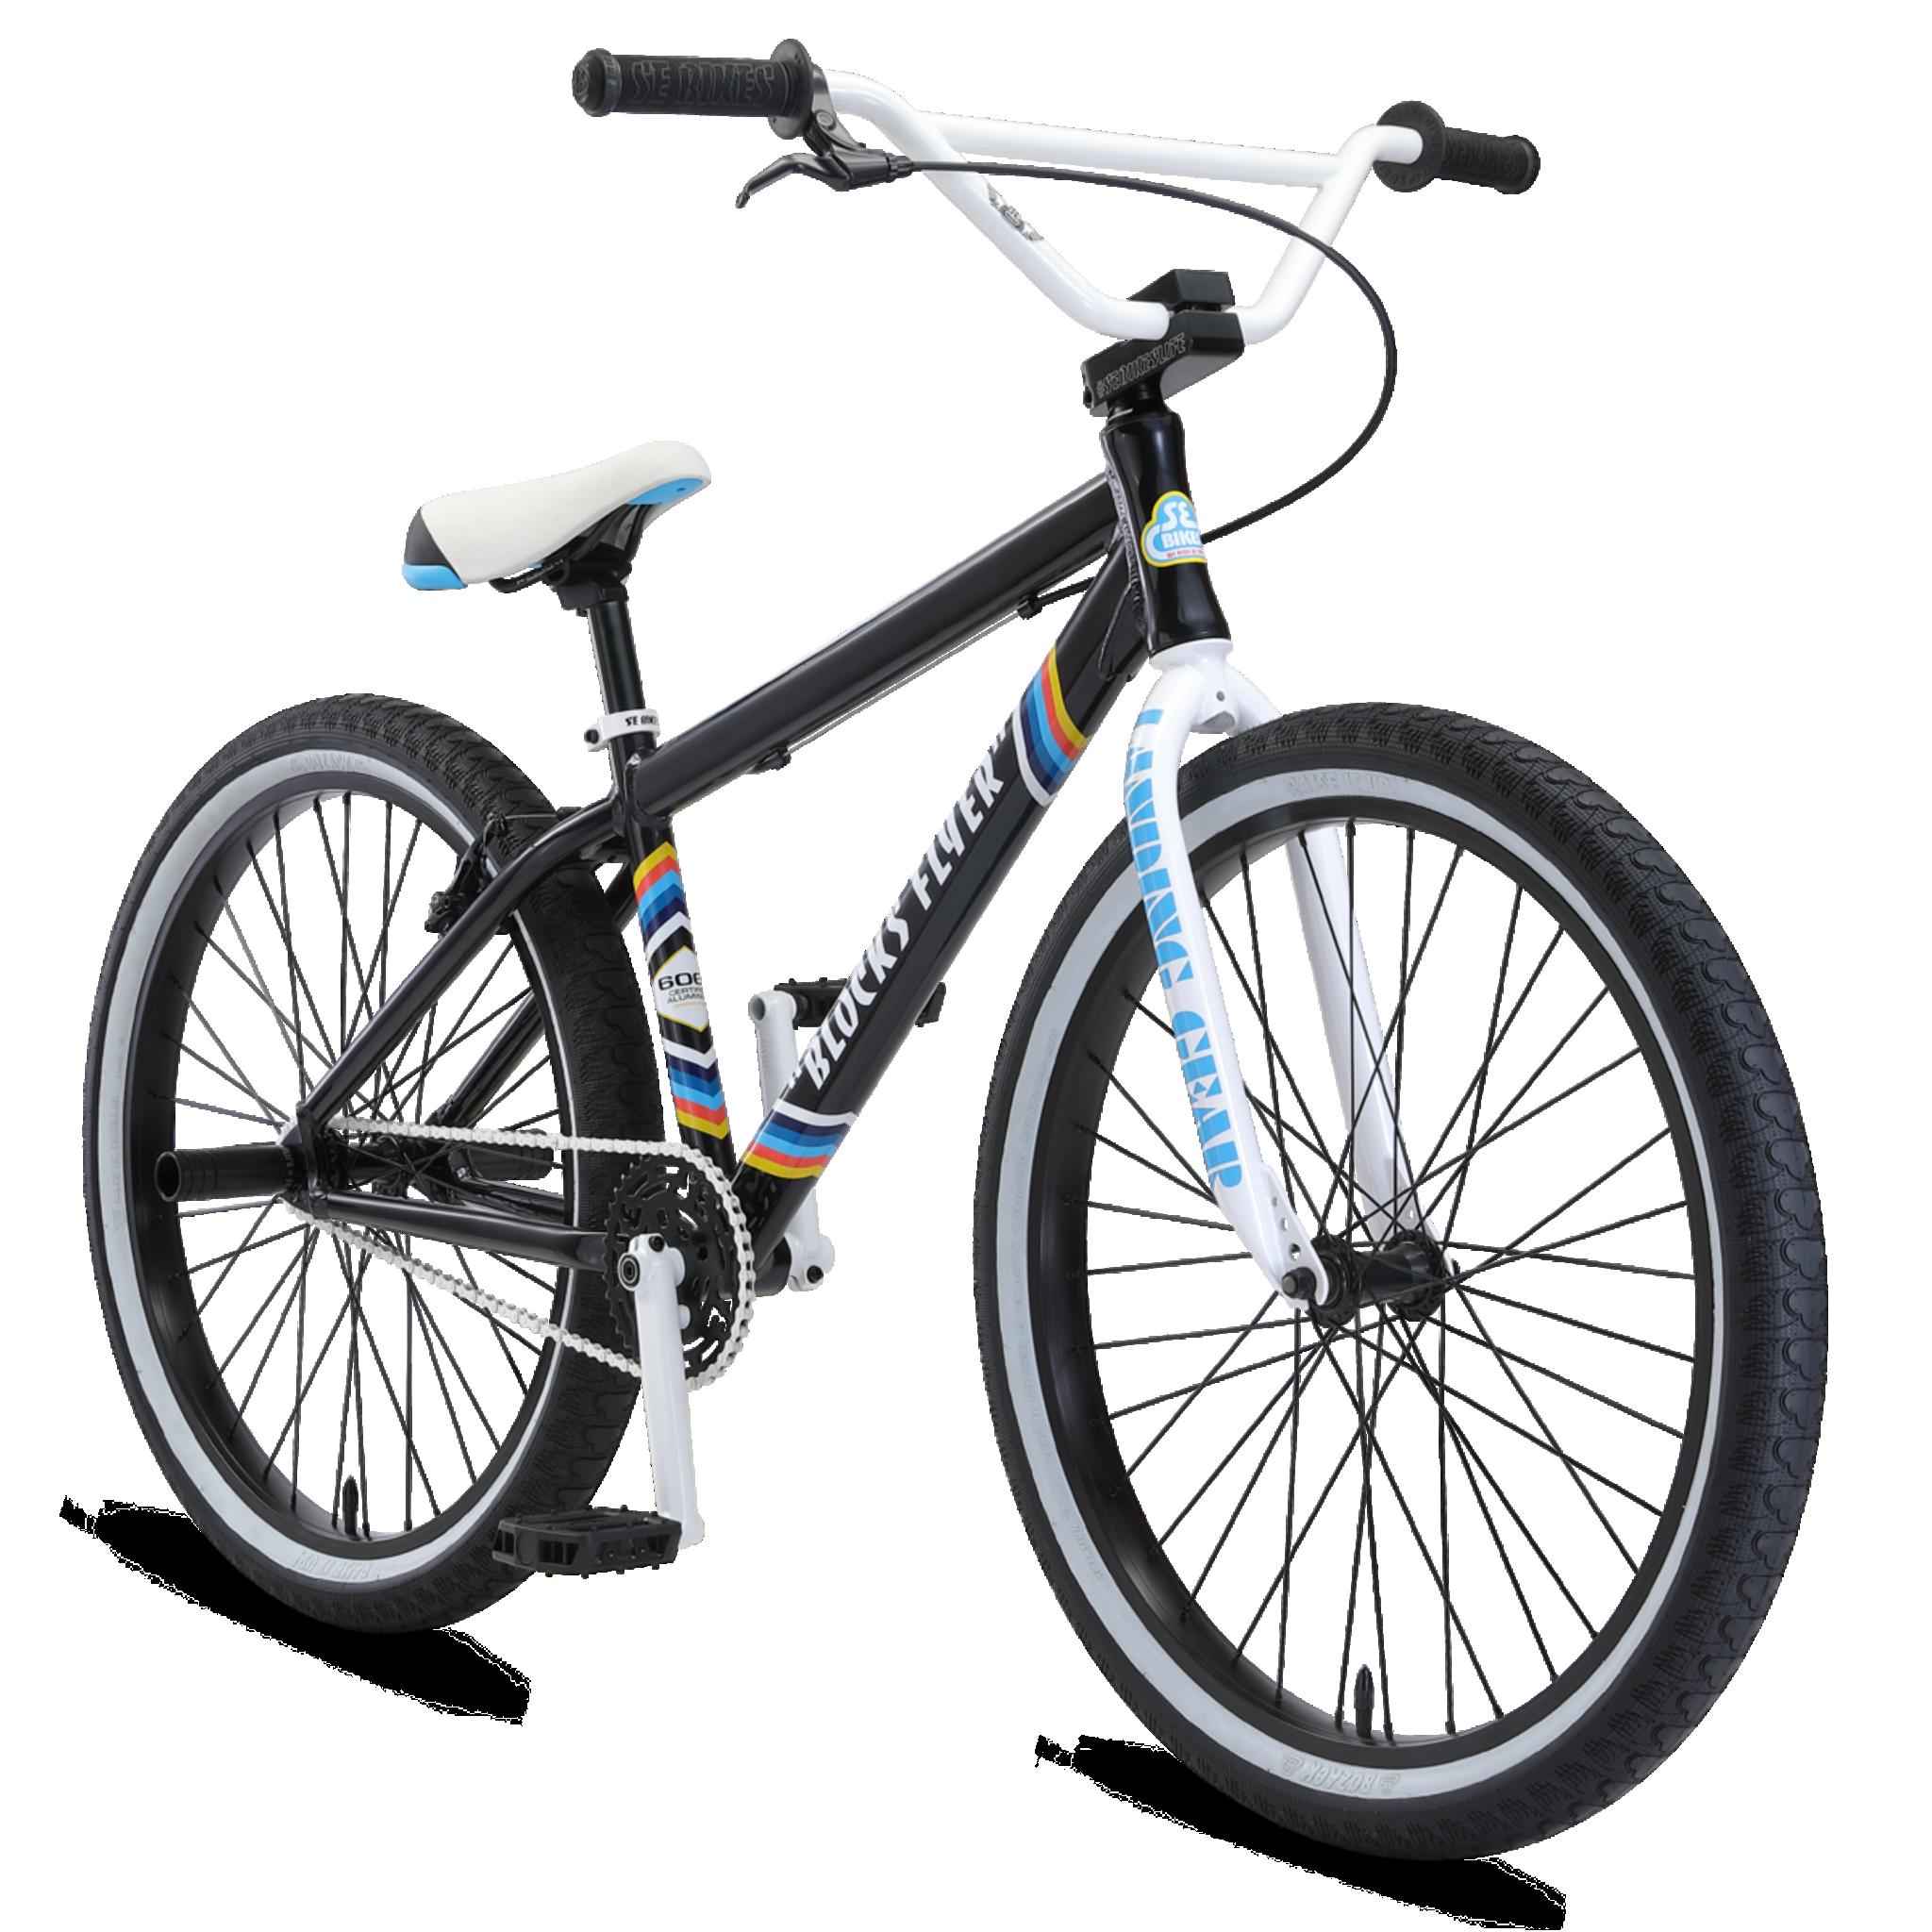 "2021 SE Bikes 26in Orange Camo Blocks Flyer Big Wheel BMX Bike 26/"" SHIPS ASAP"